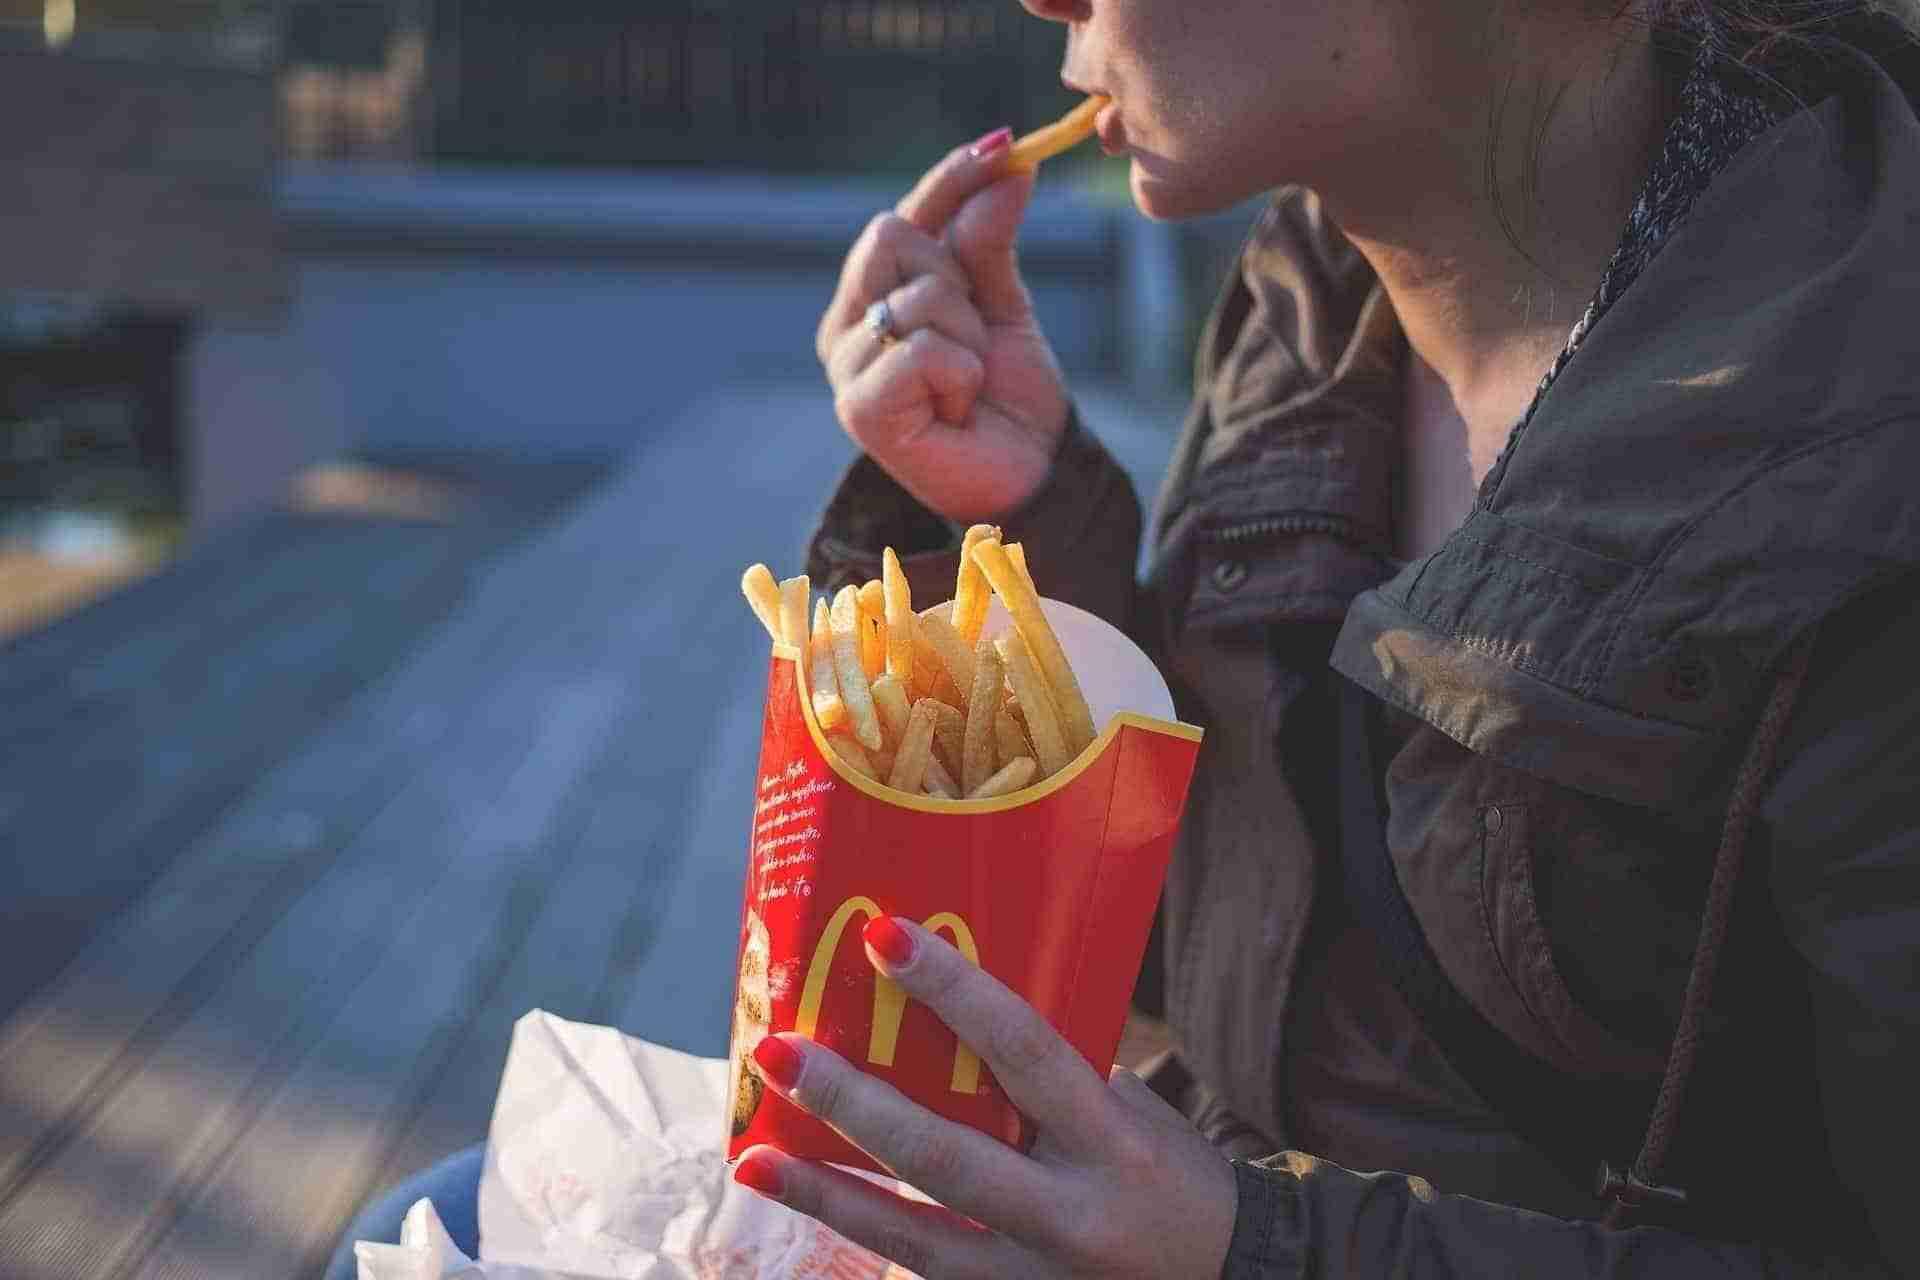 woman eating Macdonalds chips